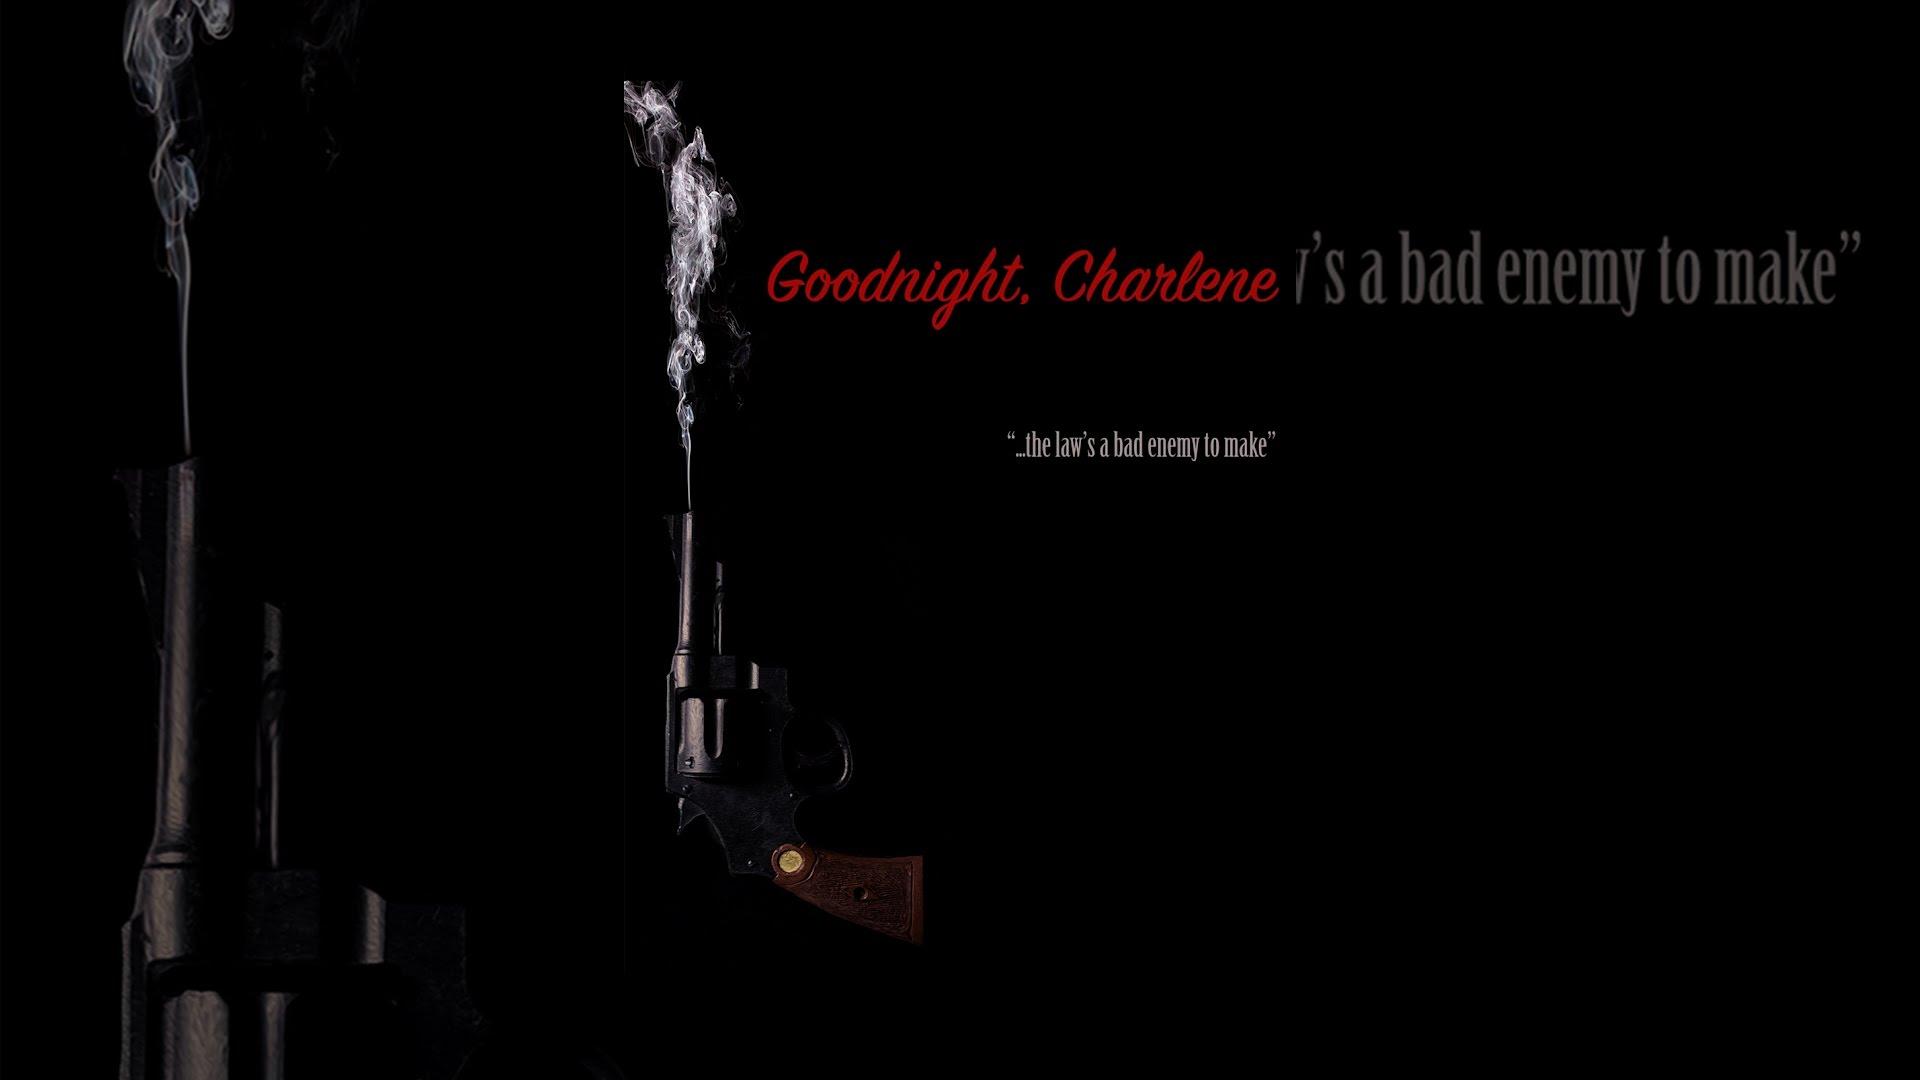 [VIDEO] - Goodnight, Charlene 1